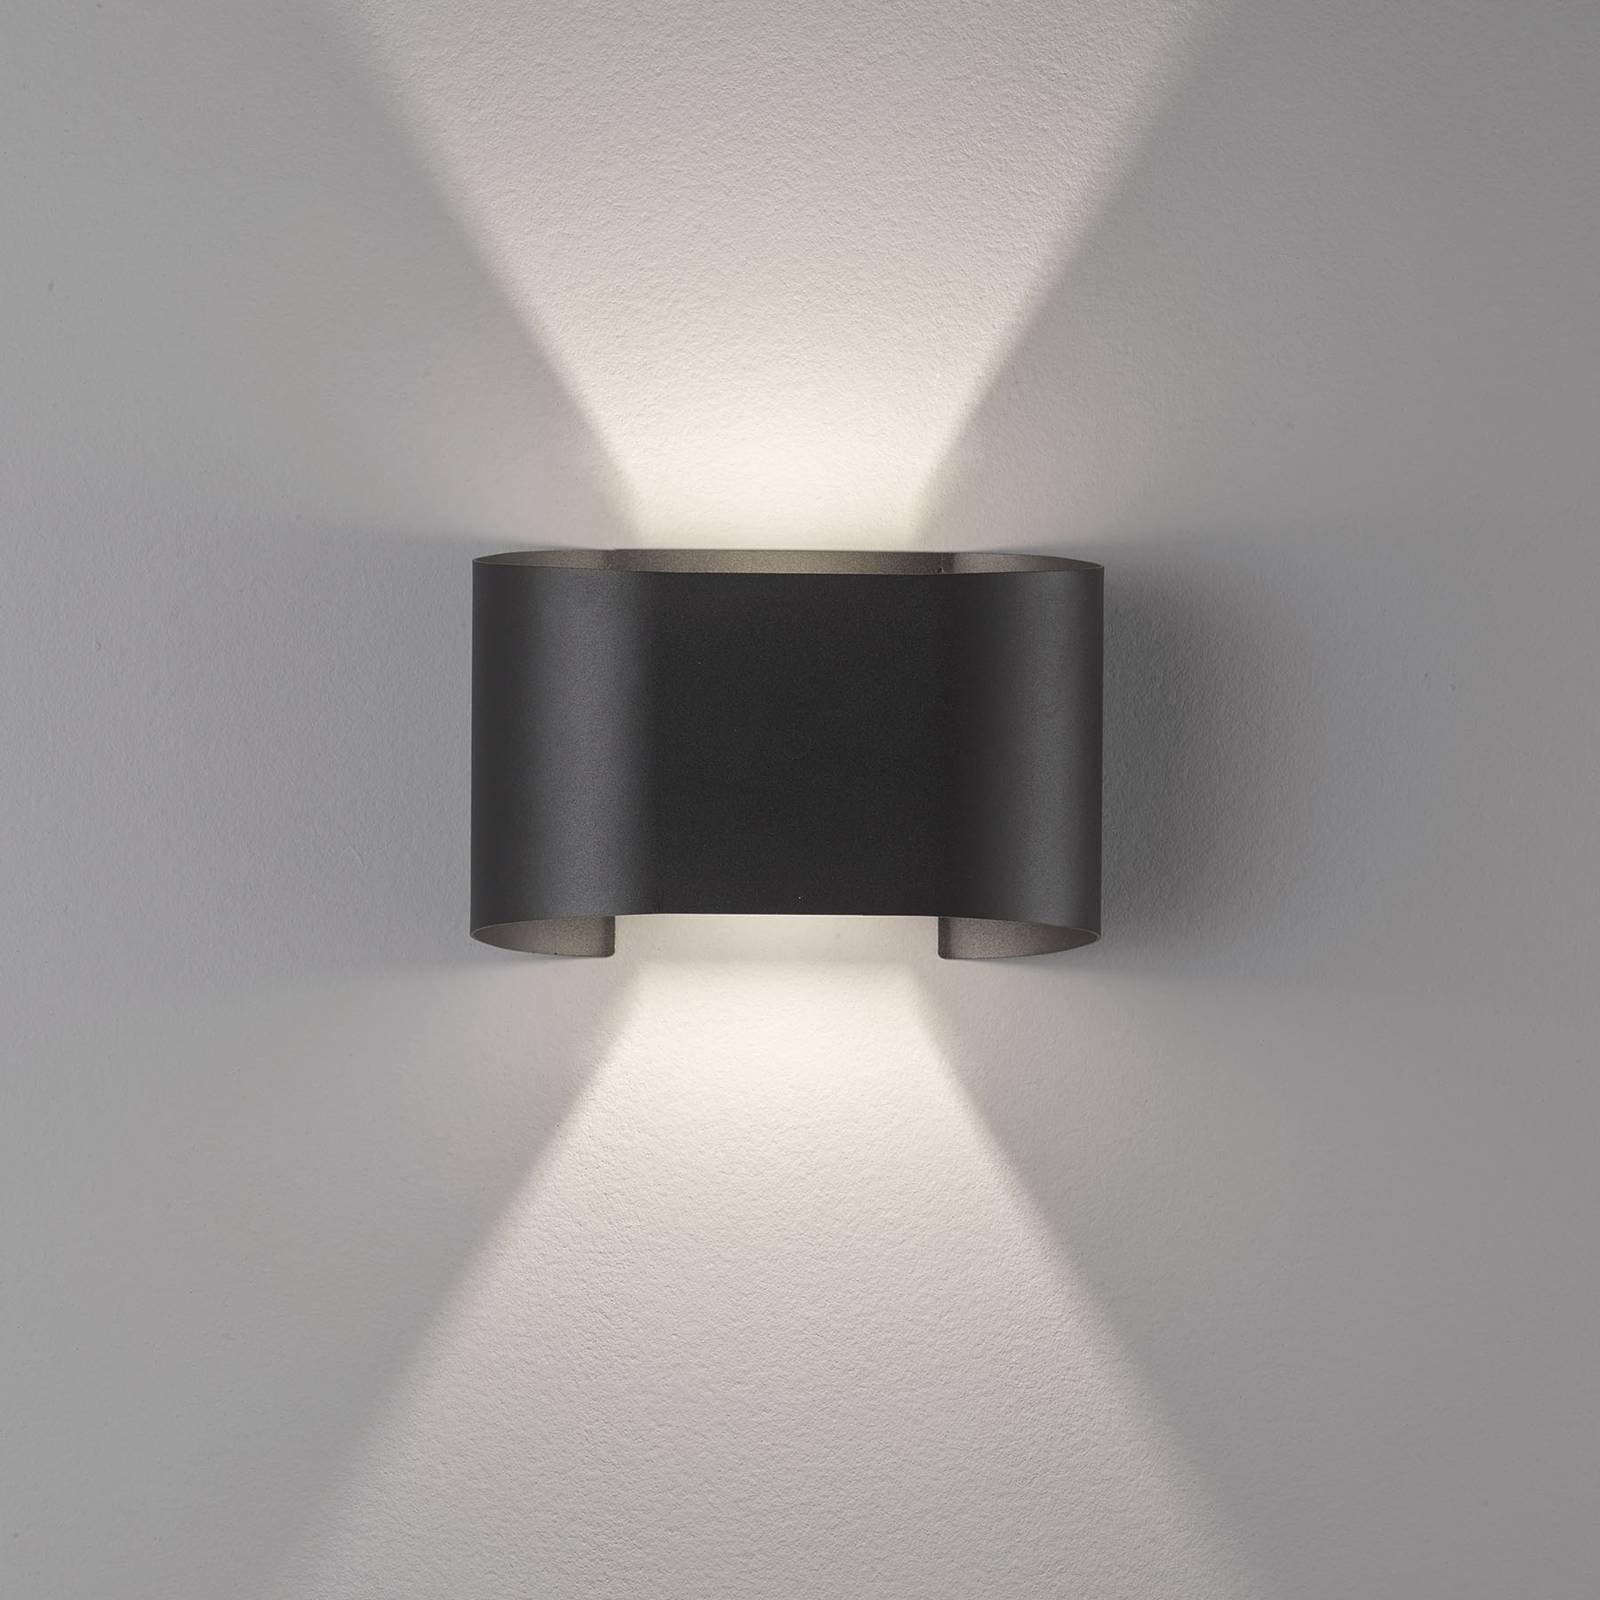 LED-vegglampe Wall, 2 lyskilder, rund, svart